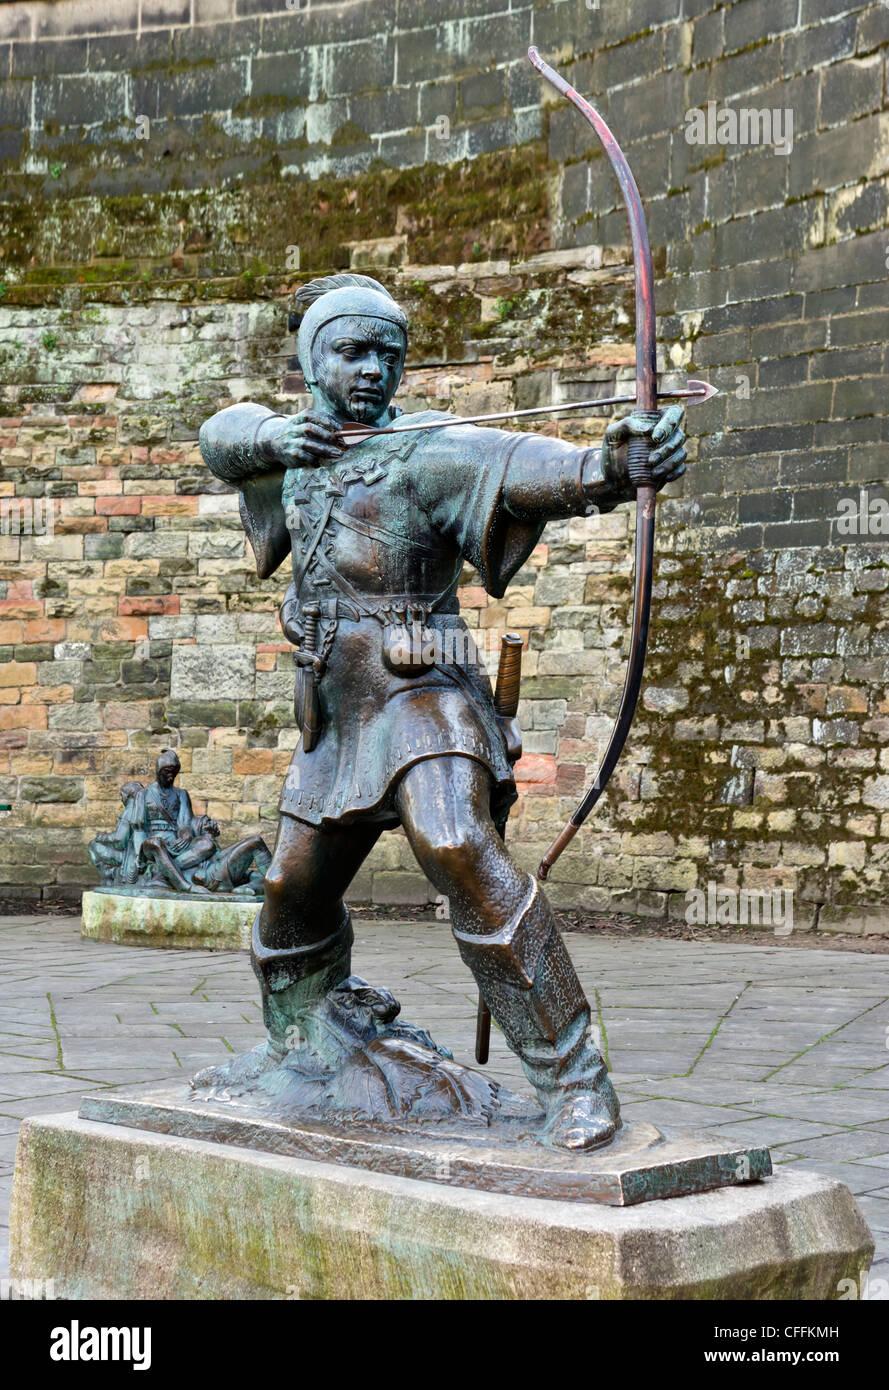 Statue of Robin Hood on Castle Road outside Nottingham Castle, Nottingham, Nottinghamshire, England, UK - Stock Image